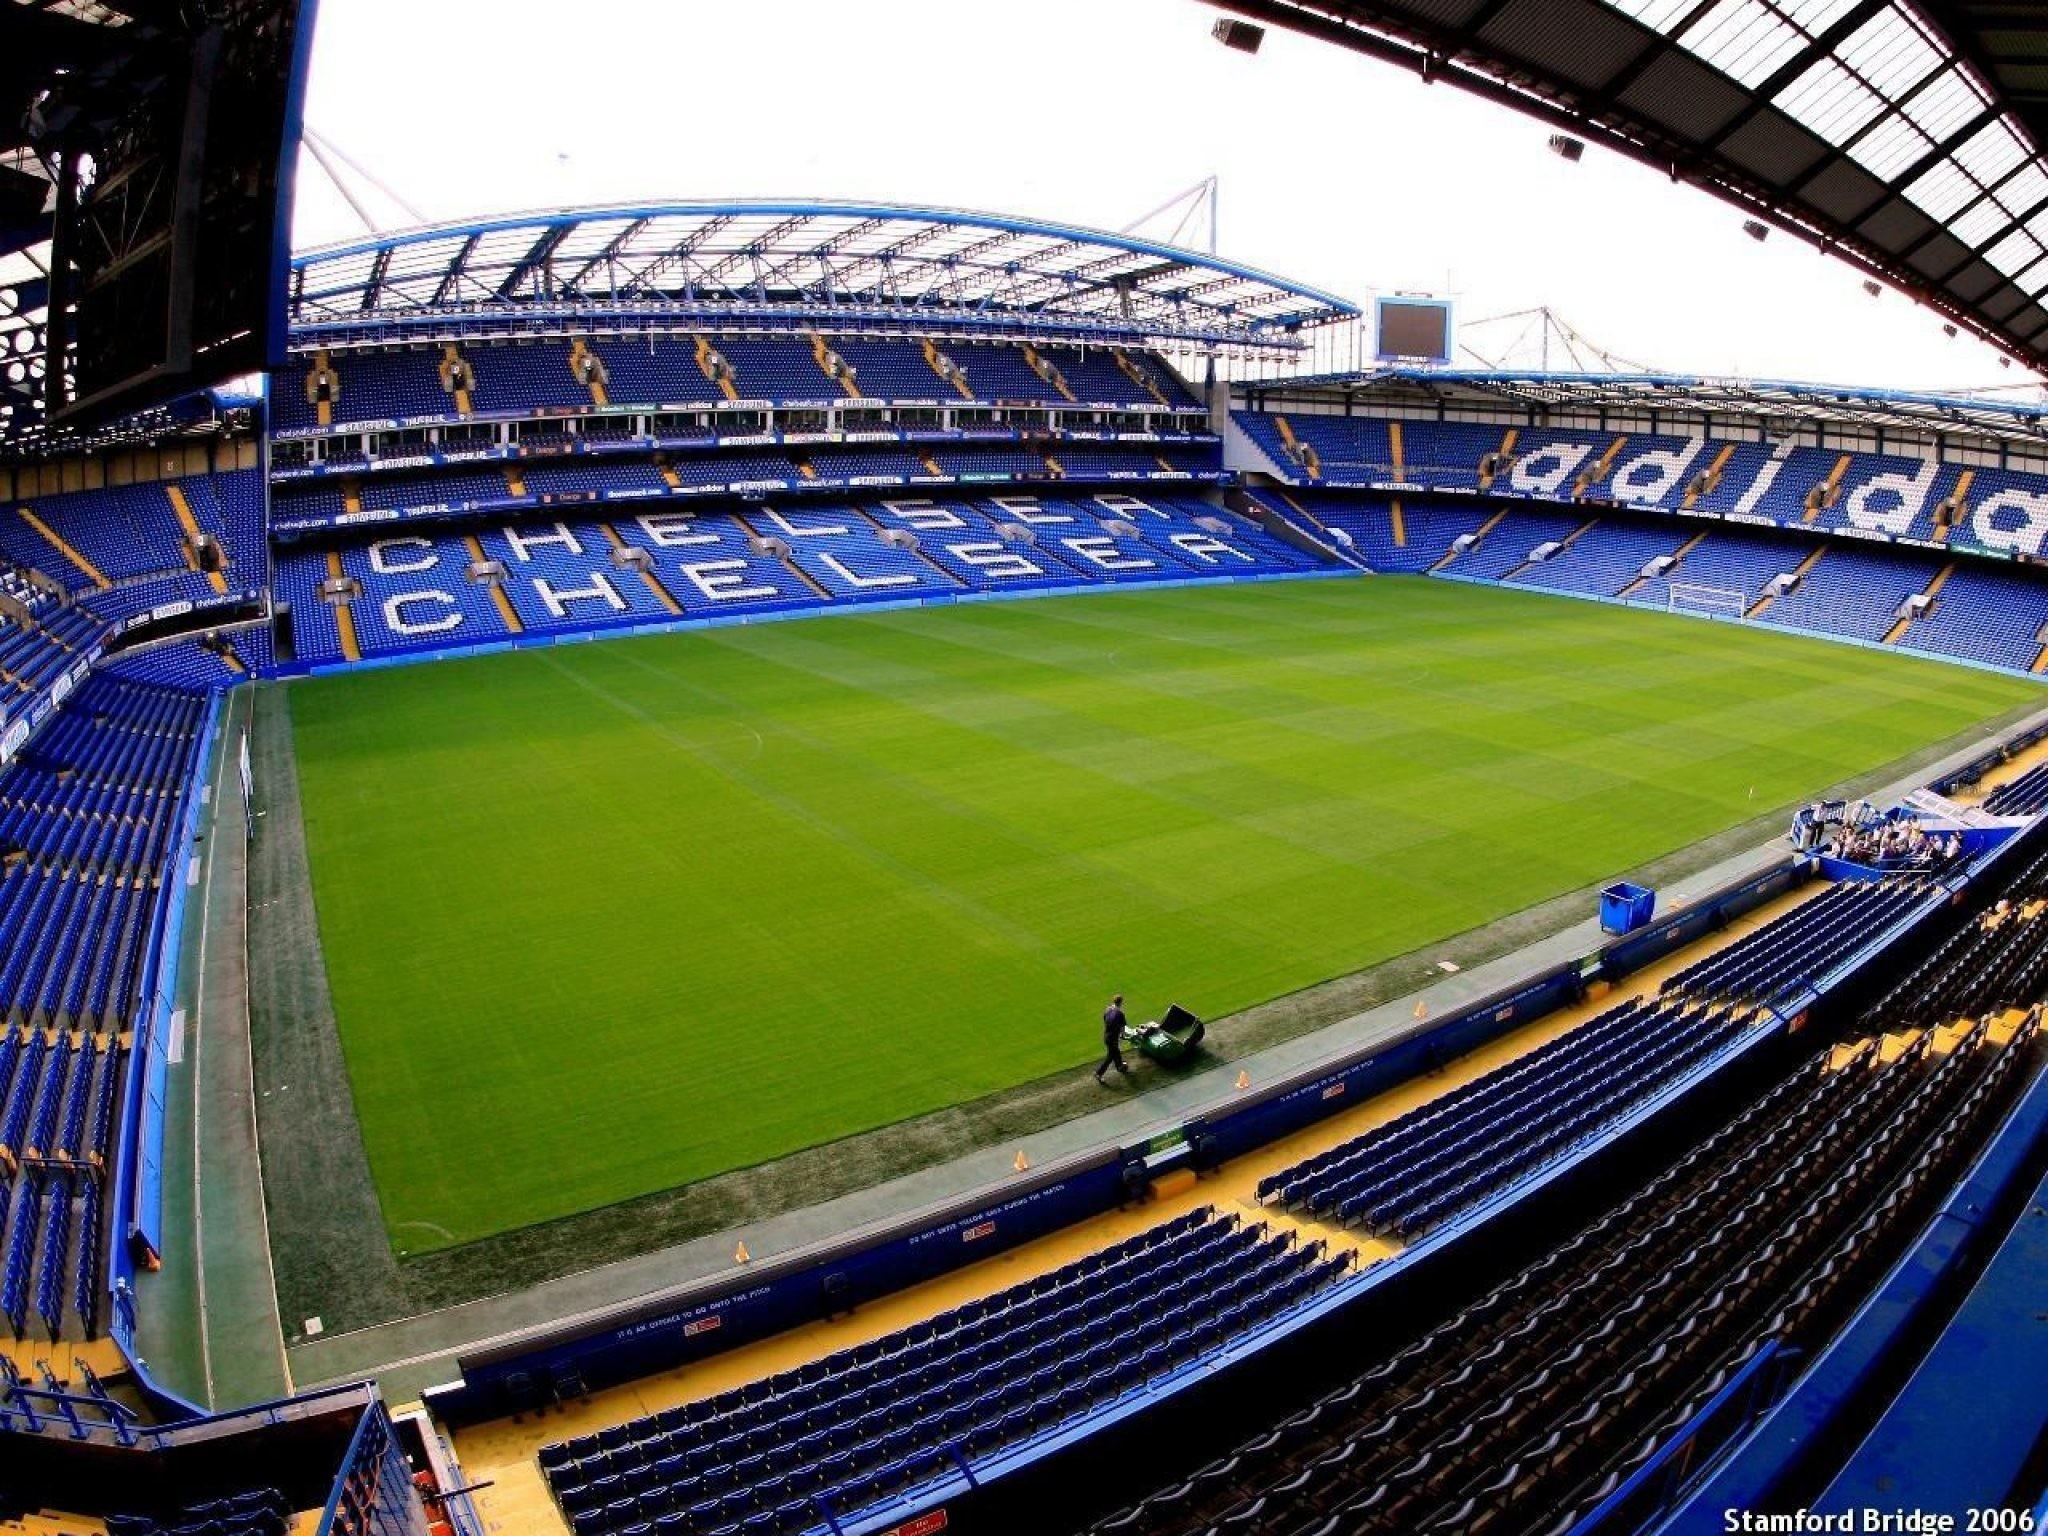 Stamford-Bridge-Stadium-Sports-Football-Chelsea-HD-Wallpaper.jpg